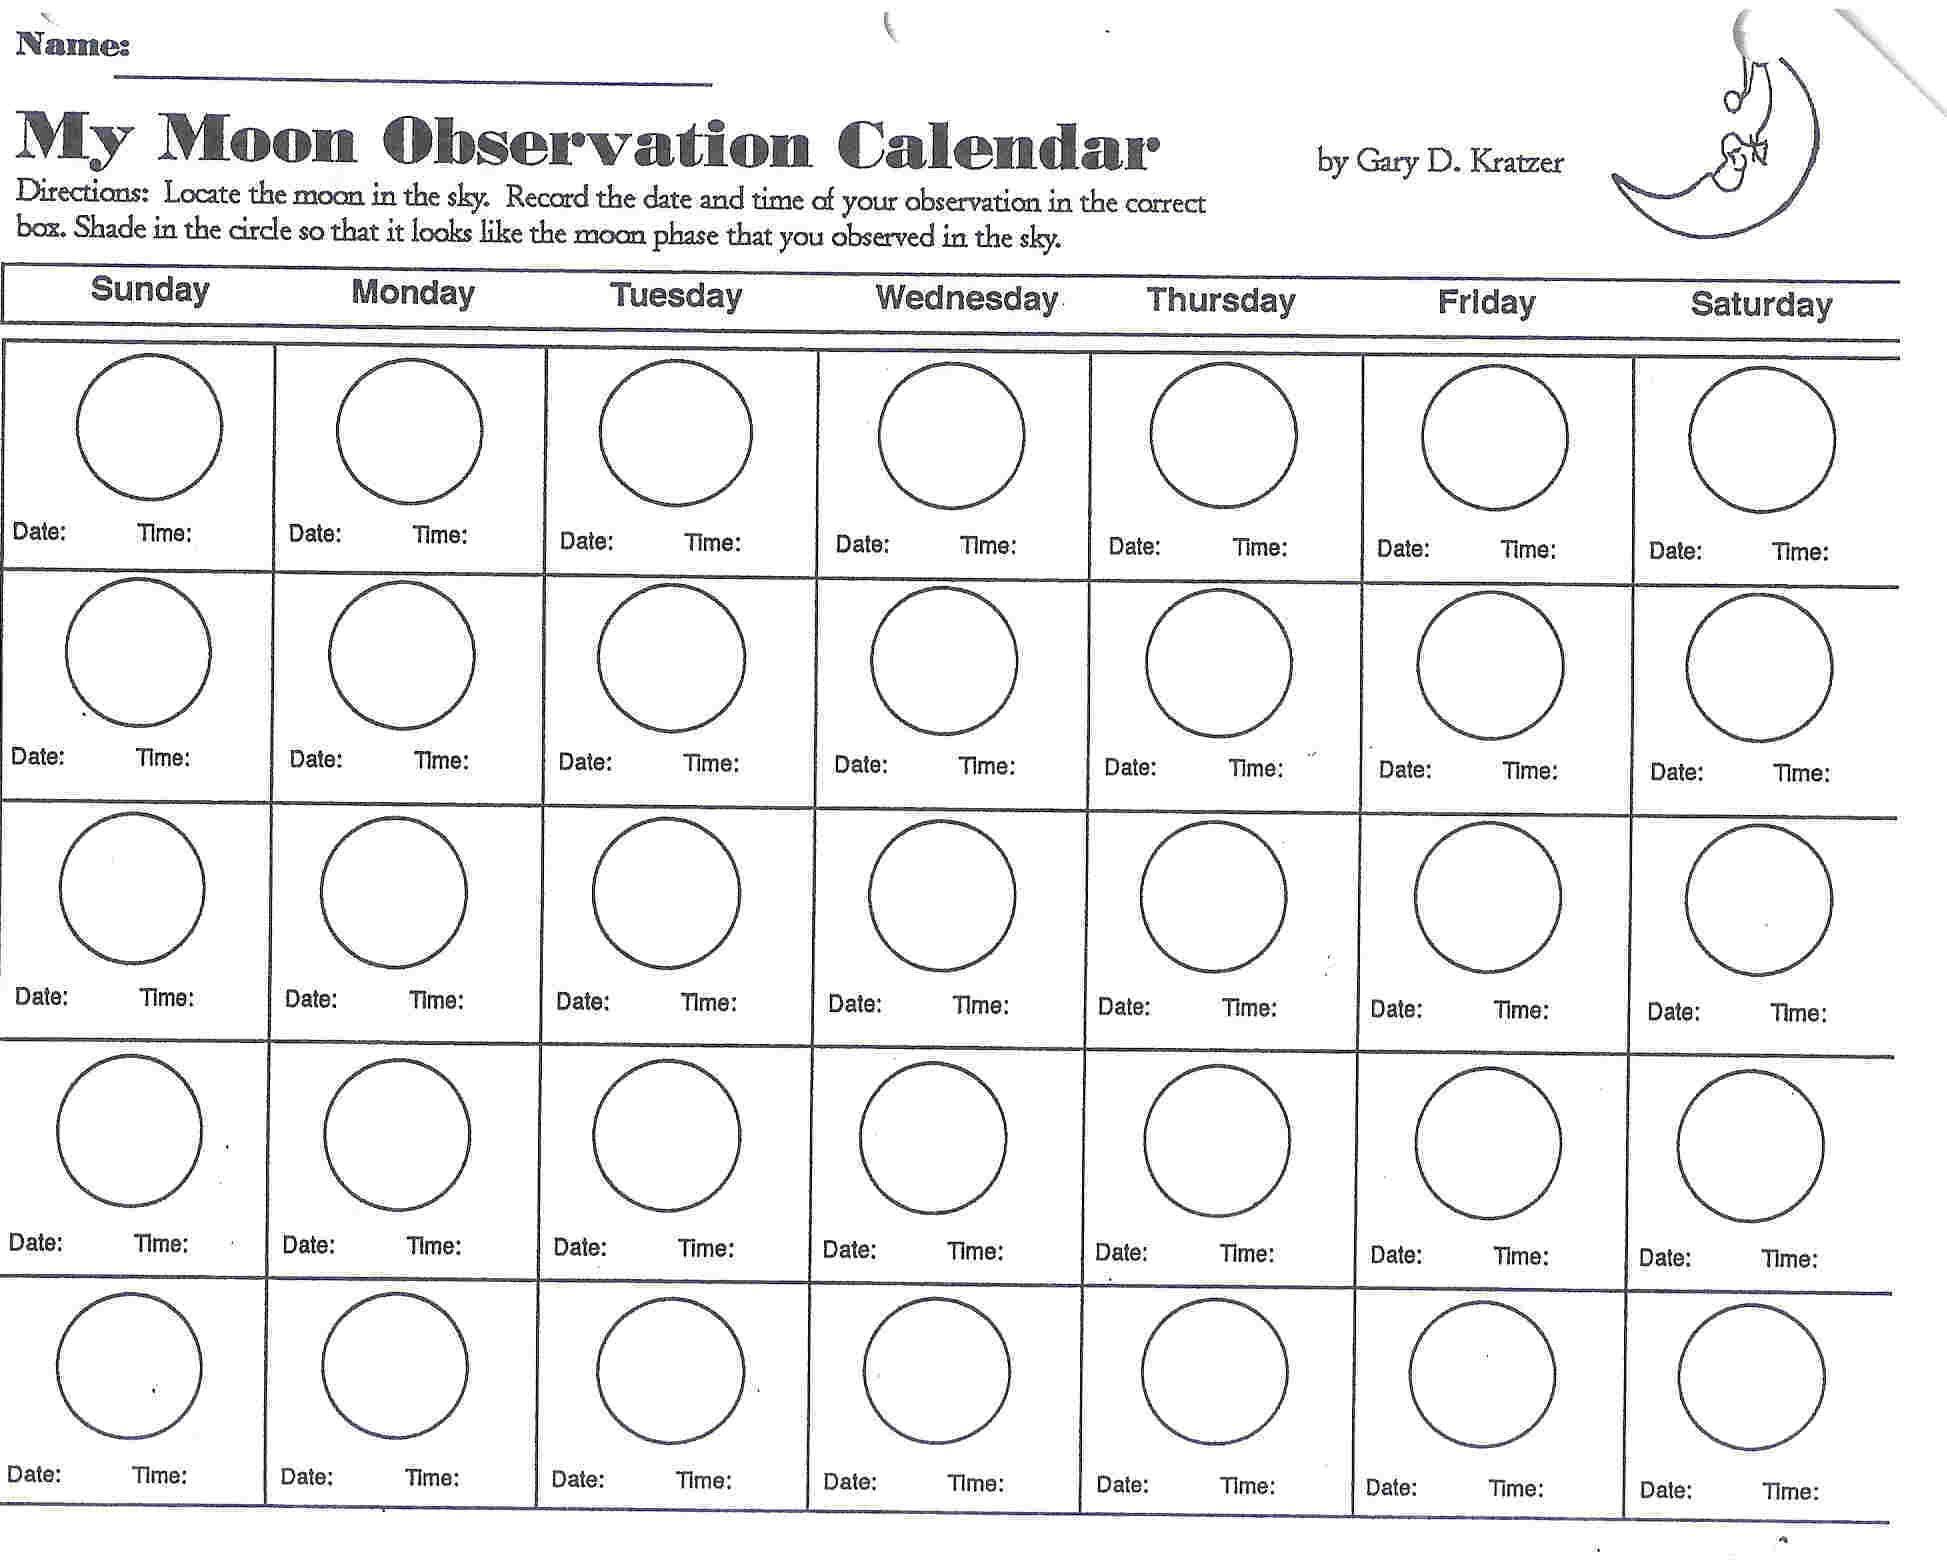 Moonobservationcalendar